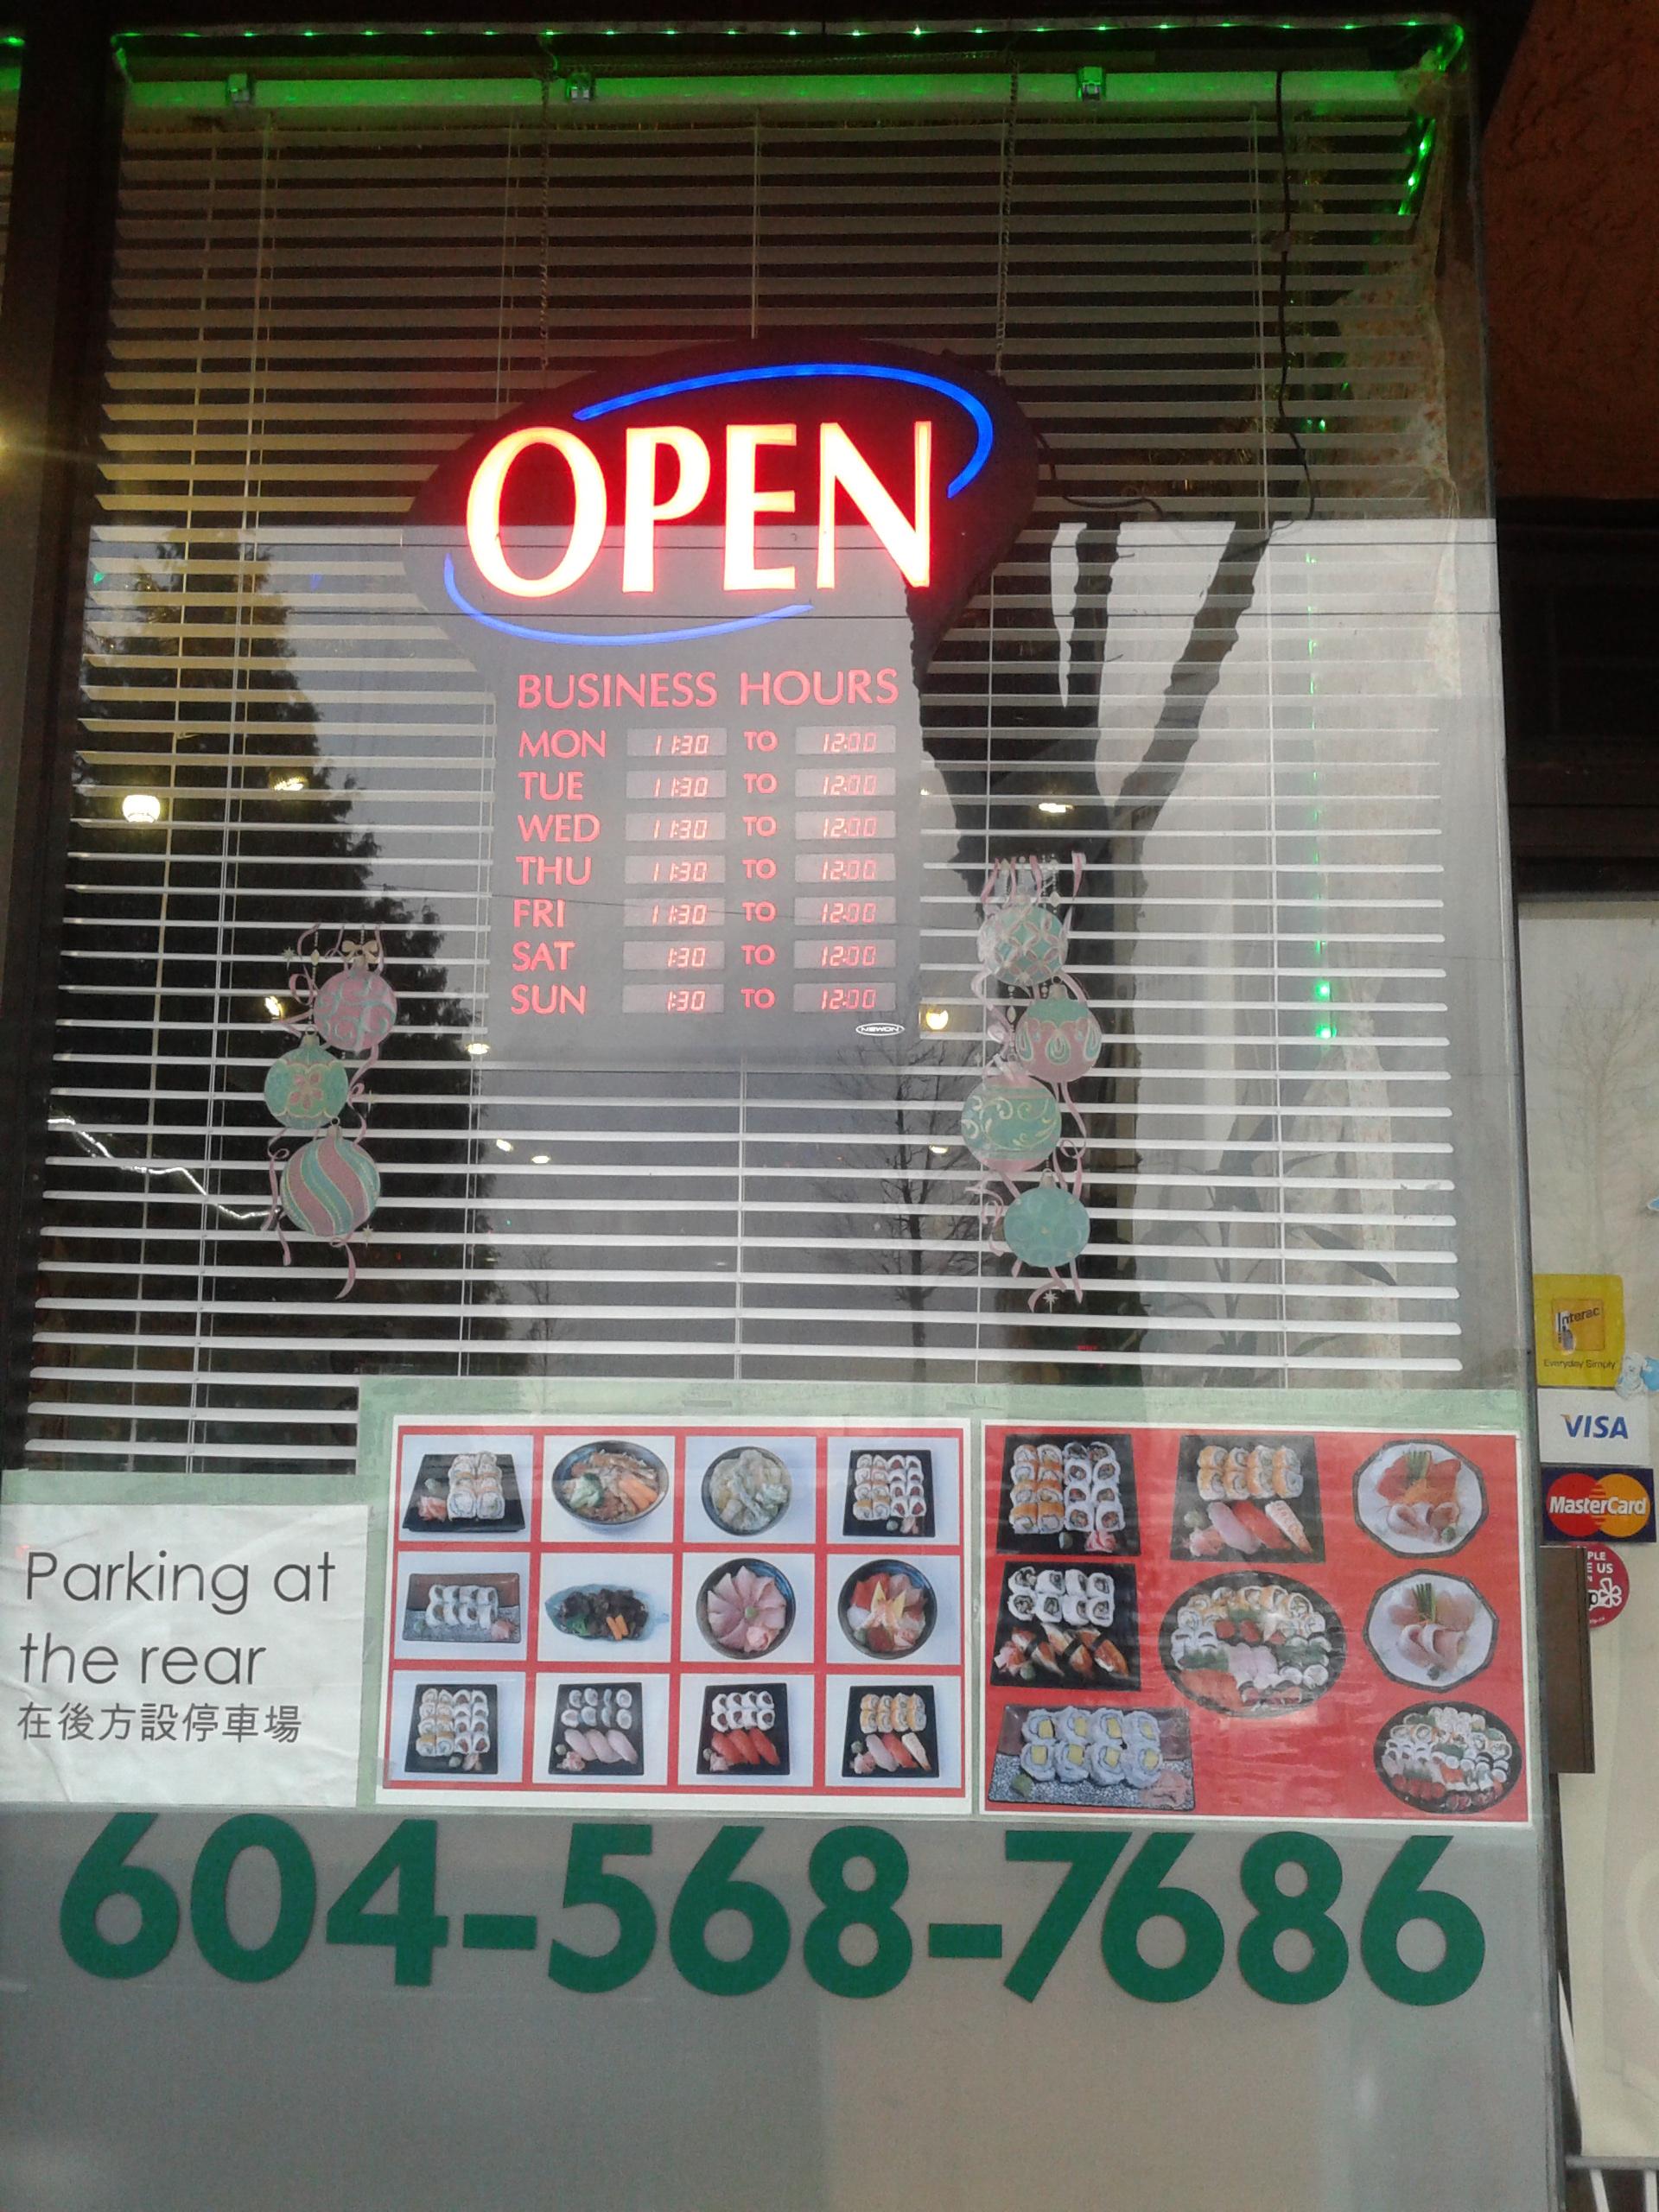 Good ol' sushi: a longtime YVR staple